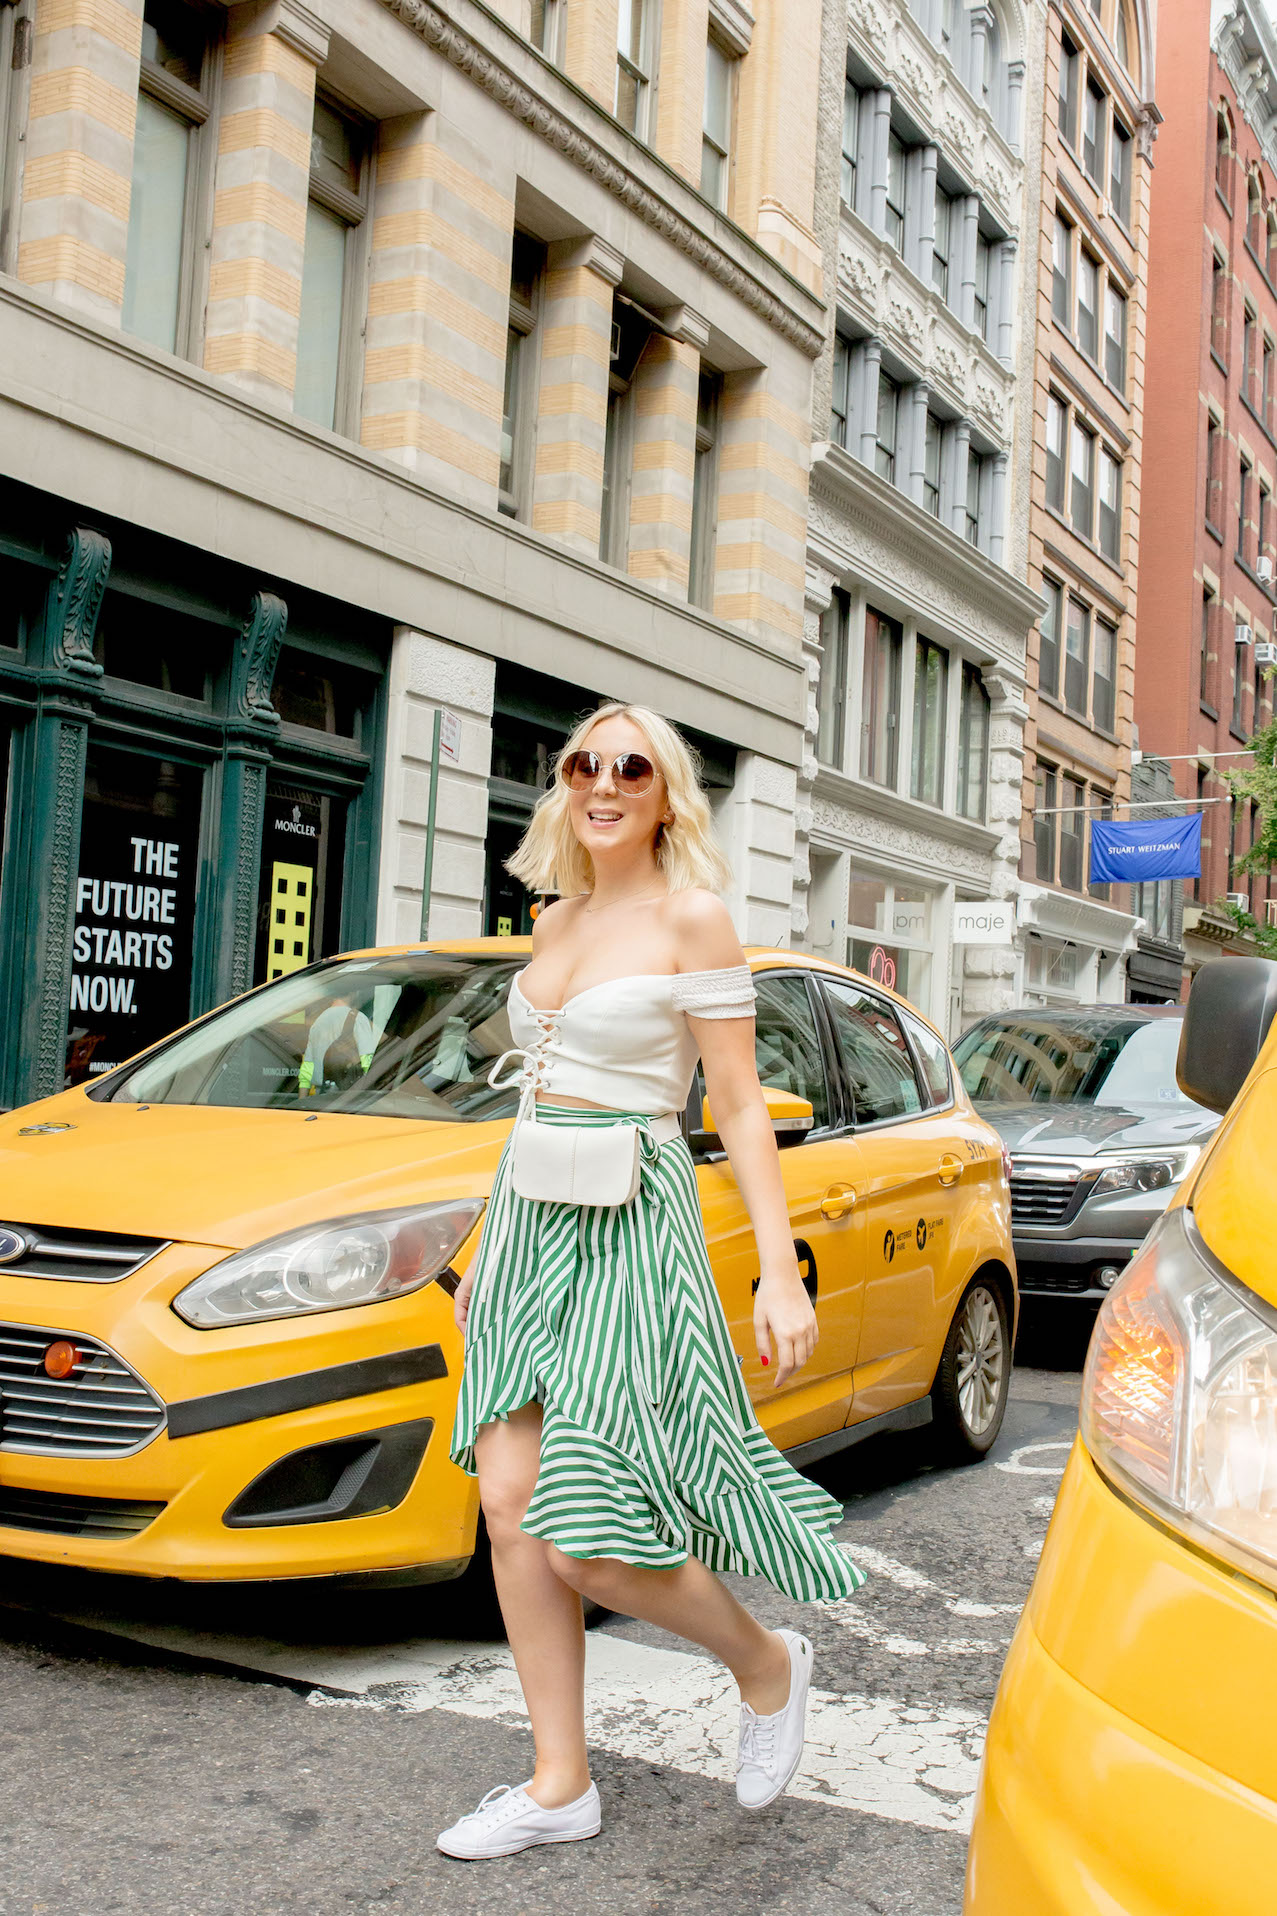 Marina-de-giovanni-style-blogger.jpg